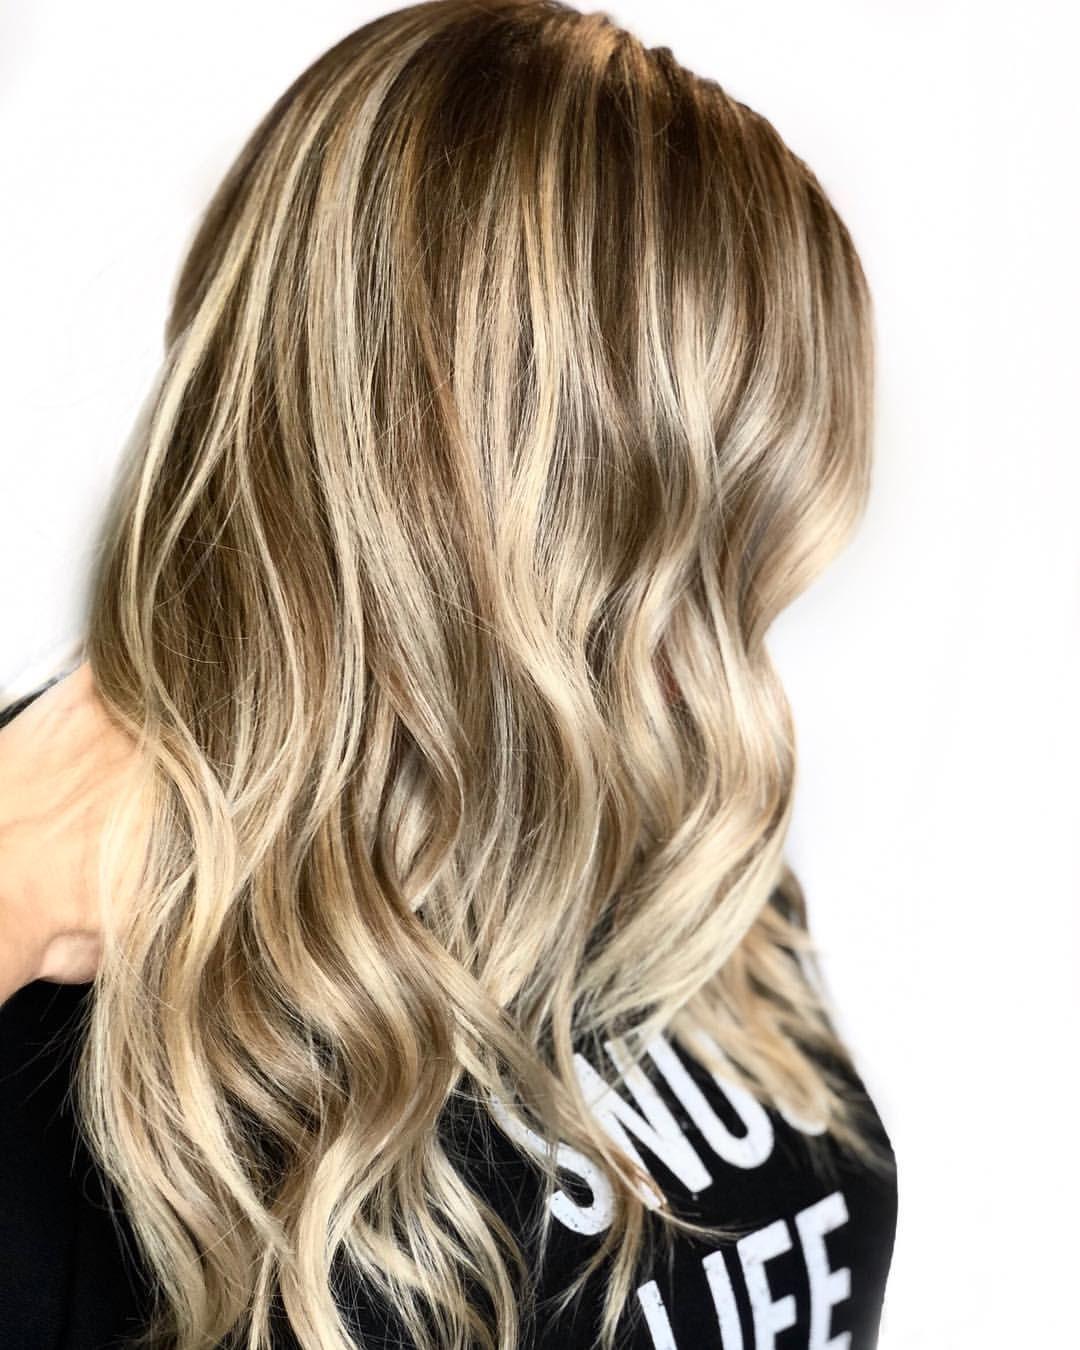 Austin Hair Color Specialist Seejencolor On Somegram Instagram Posts Videos Stories Haircolor Somegram Inst Austin Hair Hair Styles Long Hair Styles